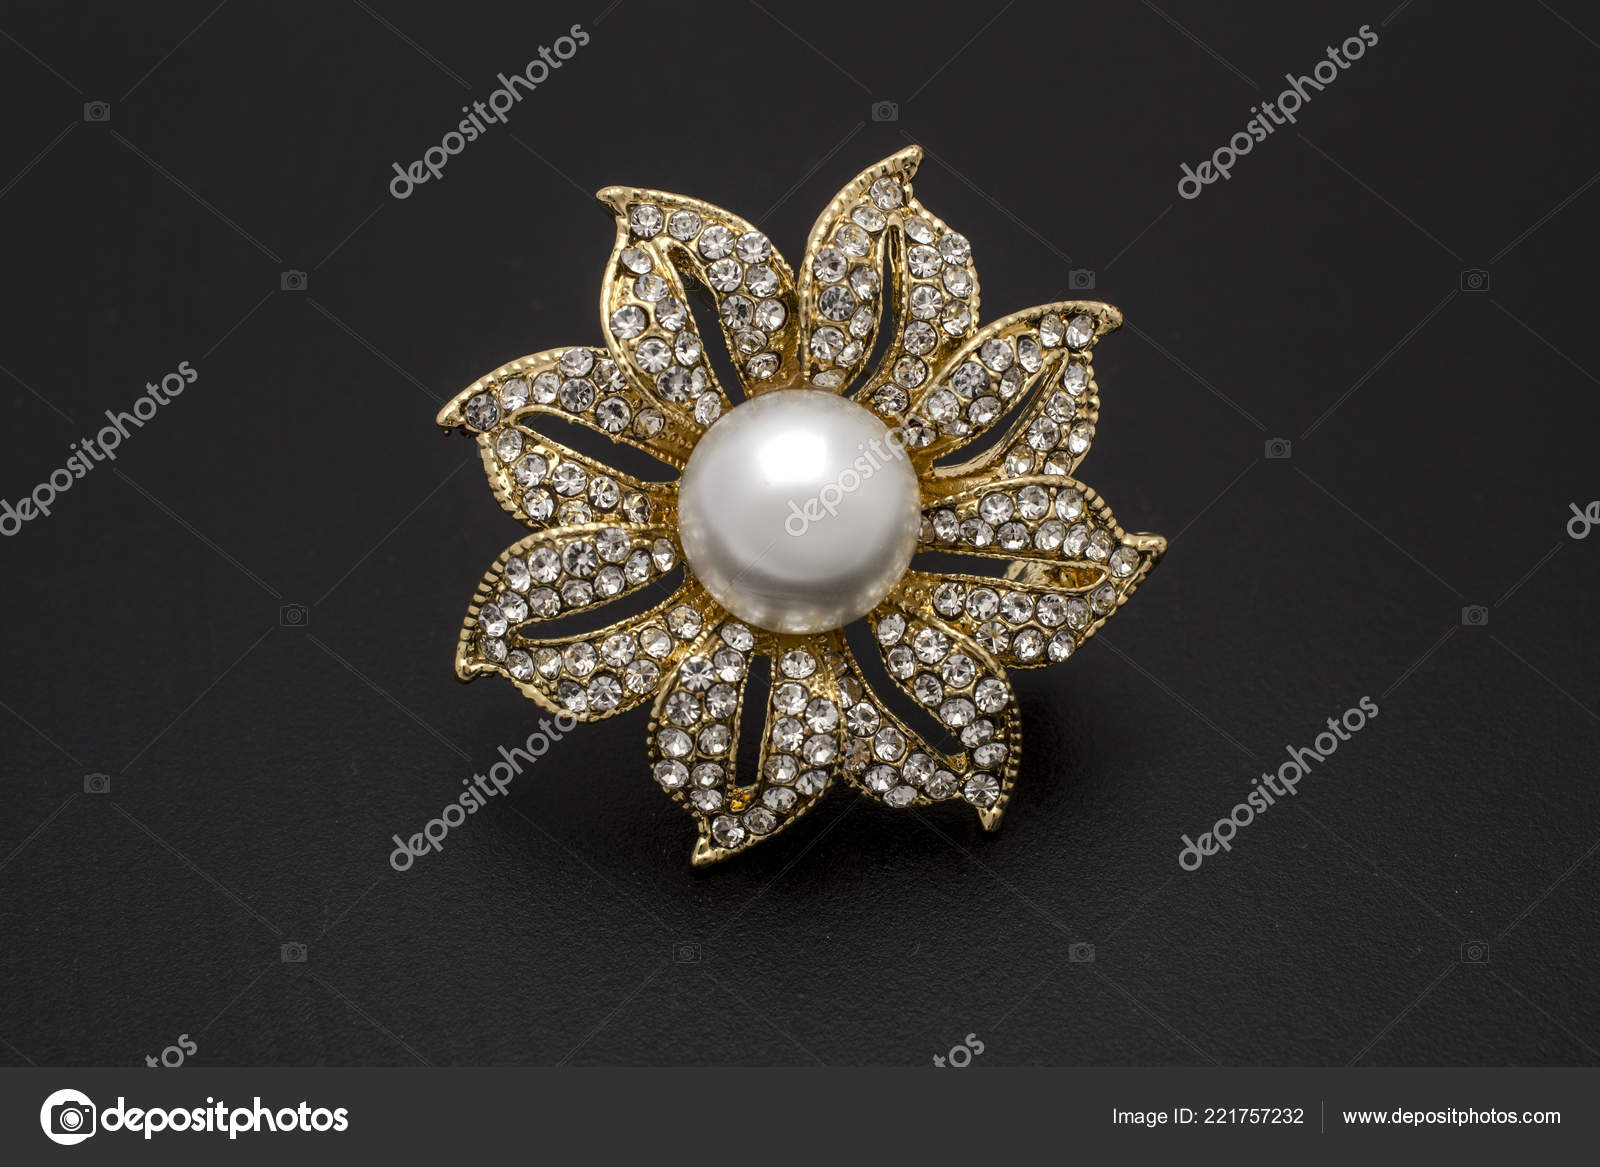 de309e53f3bee Gold Brooch Flower Pearl Gems Isolated Black — Stock Photo © vi0222 ...